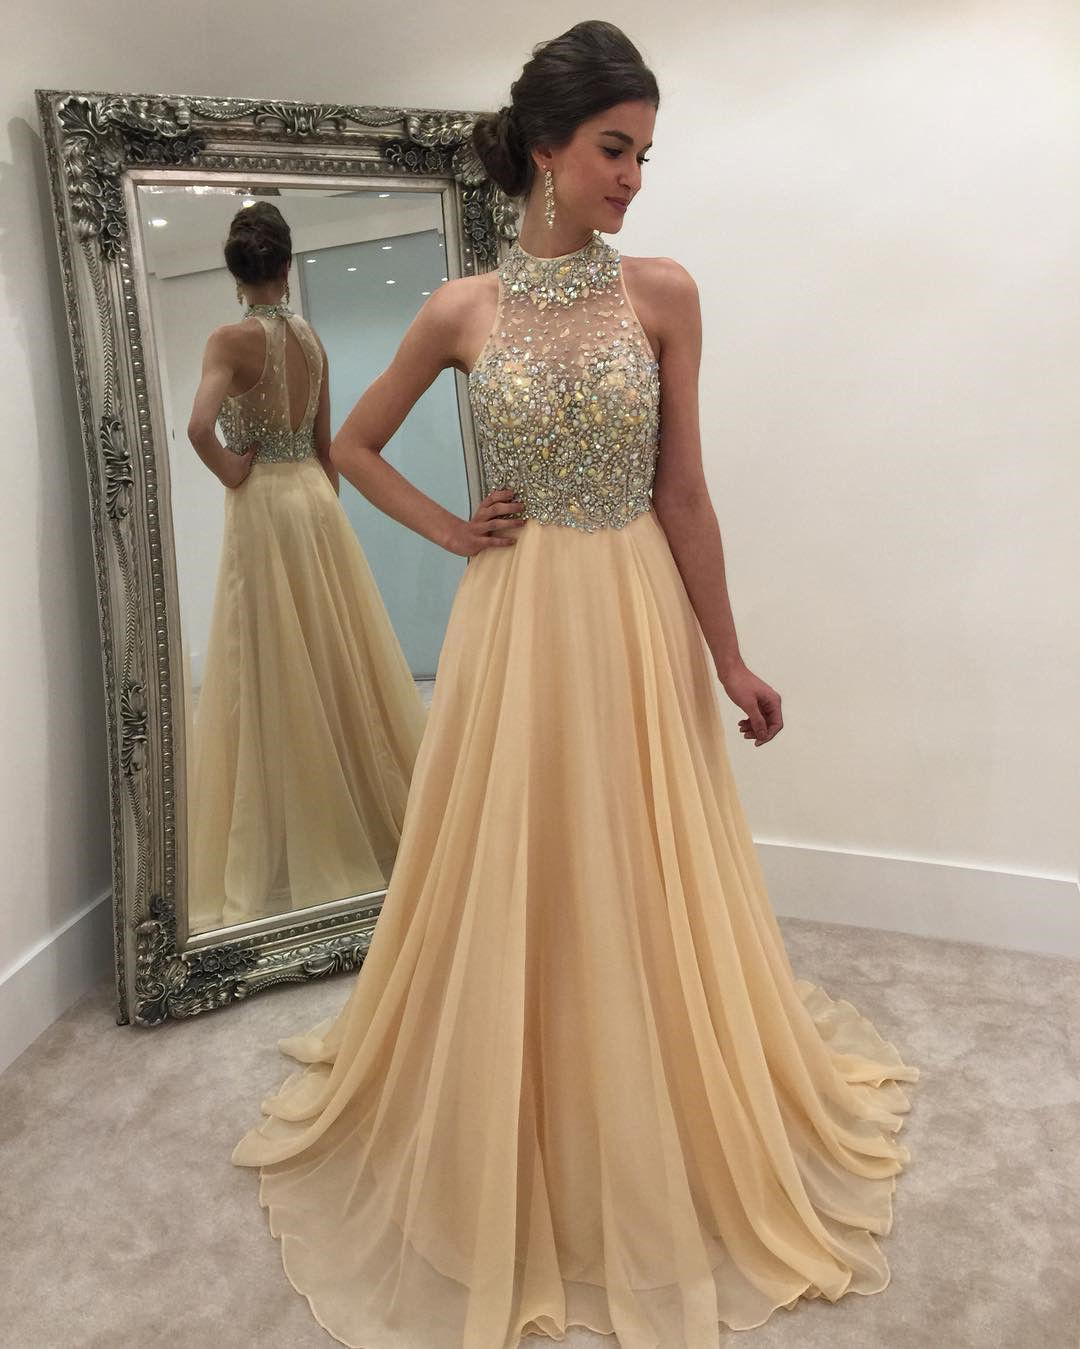 5a9c9f6217 Compre Chifón Vestidos De Fiesta Largos 2018 Cristales Vestidos Formales Vestidos  De Noche A Medida A  170.86 Del Newstore201899